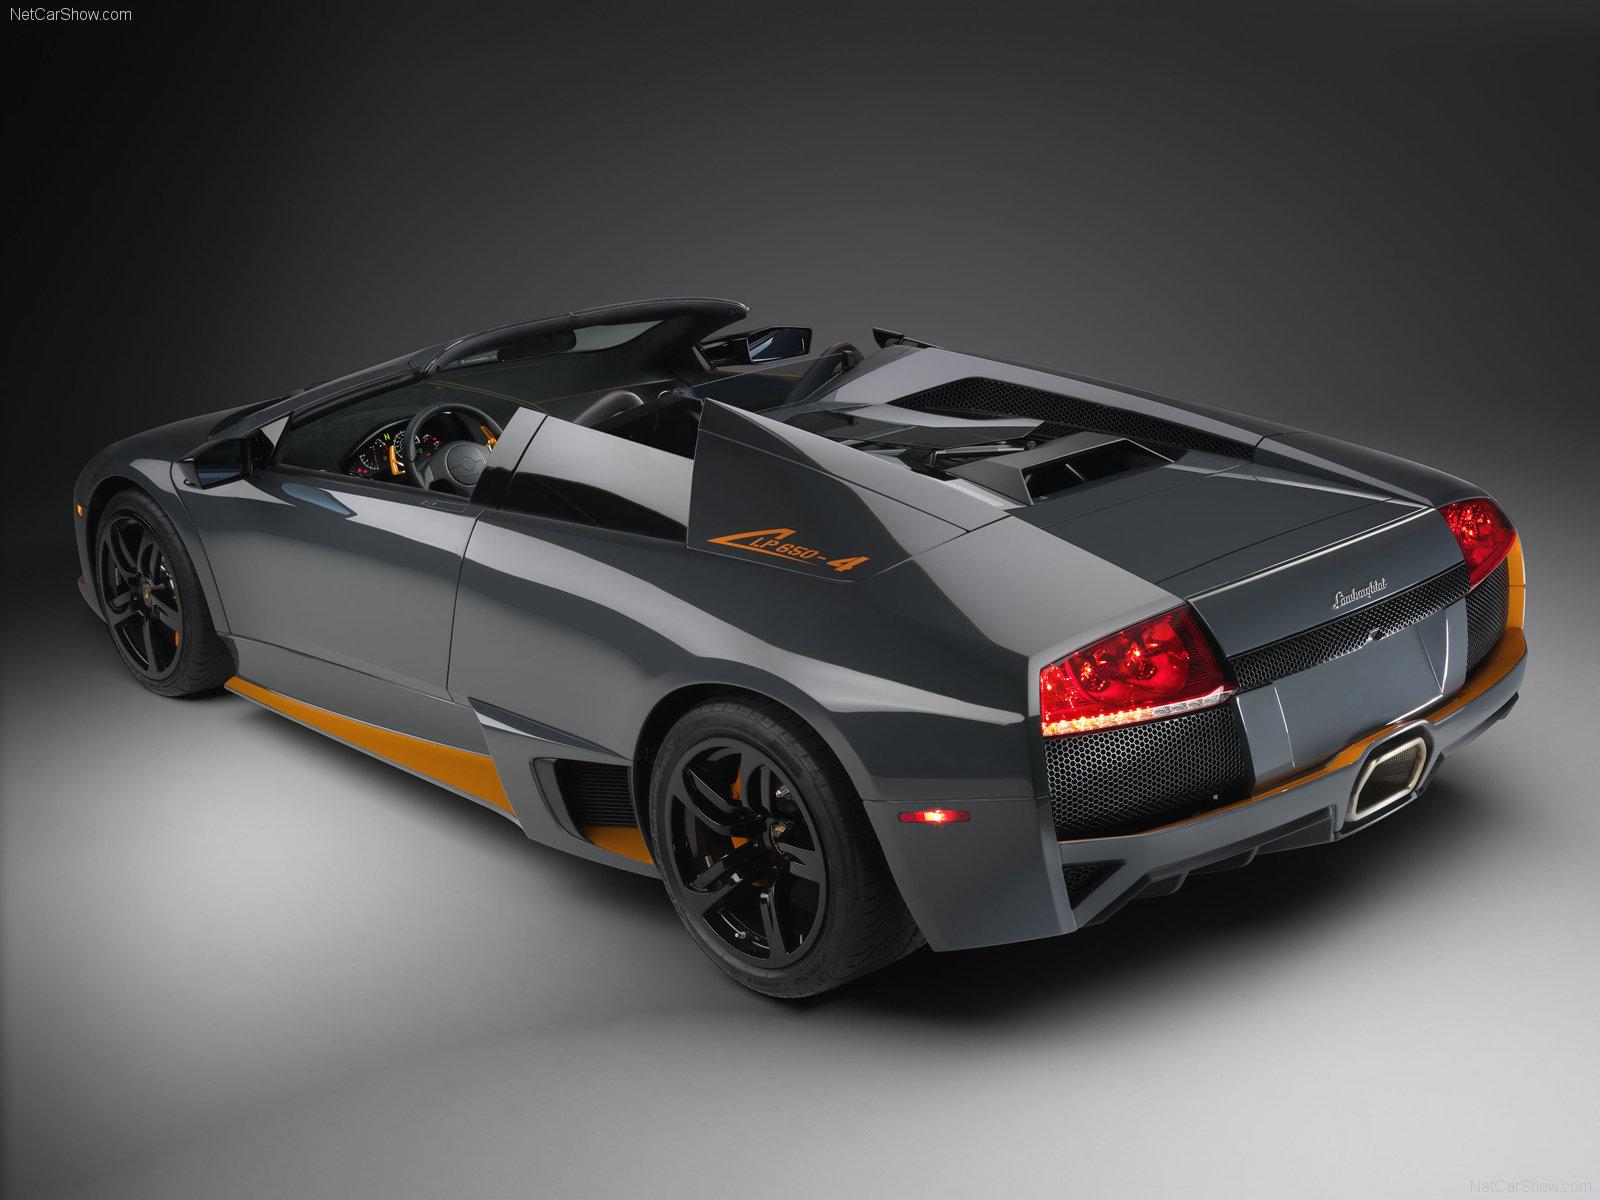 Hình ảnh siêu xe Lamborghini Murcielago LP650-4 Roadster 2010 & nội ngoại thất